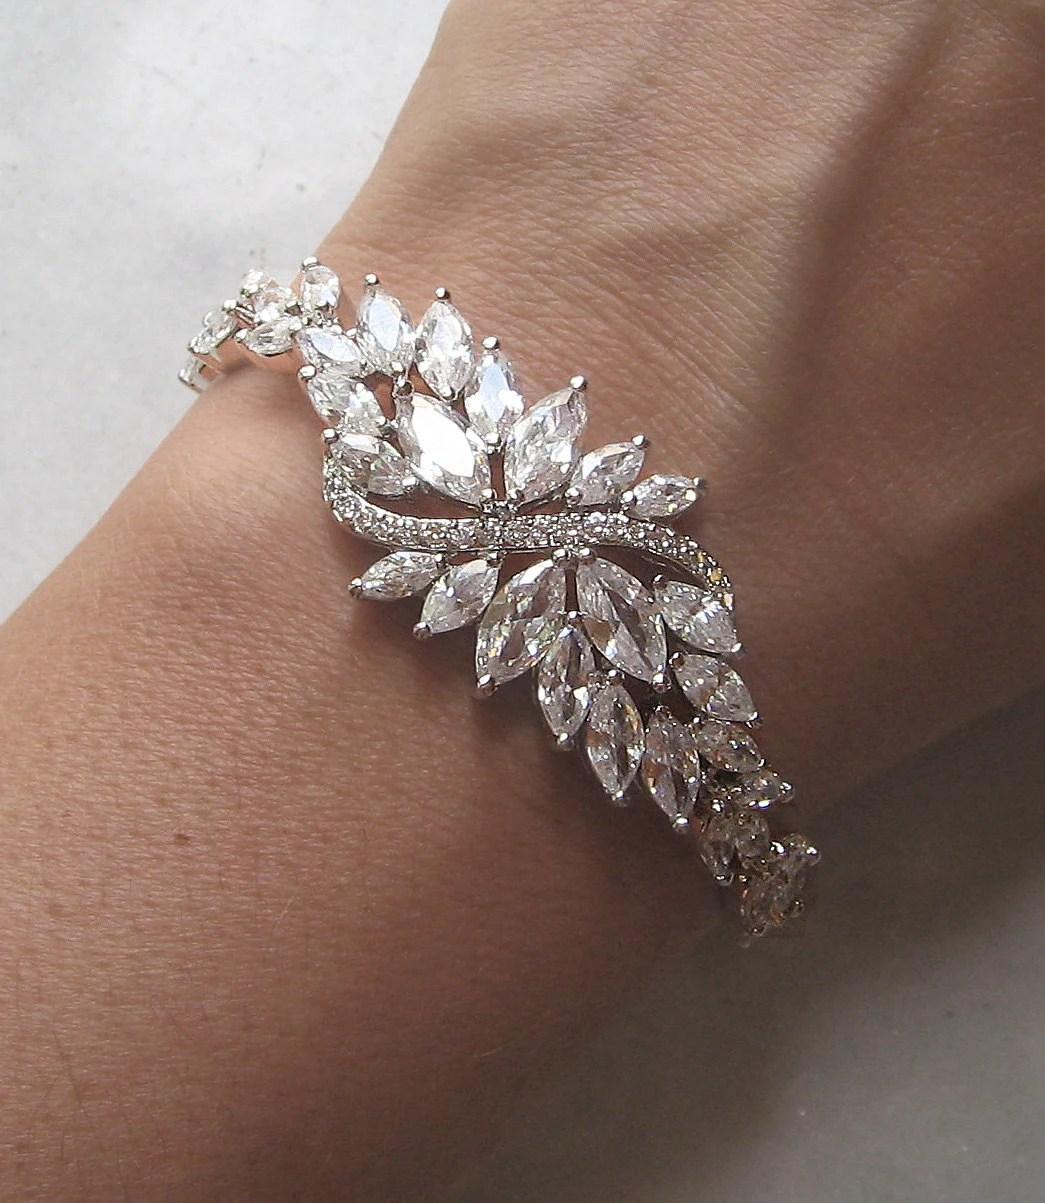 Crystal Wedding Bracelet Cubic Zirconia Bracelet Swarovski